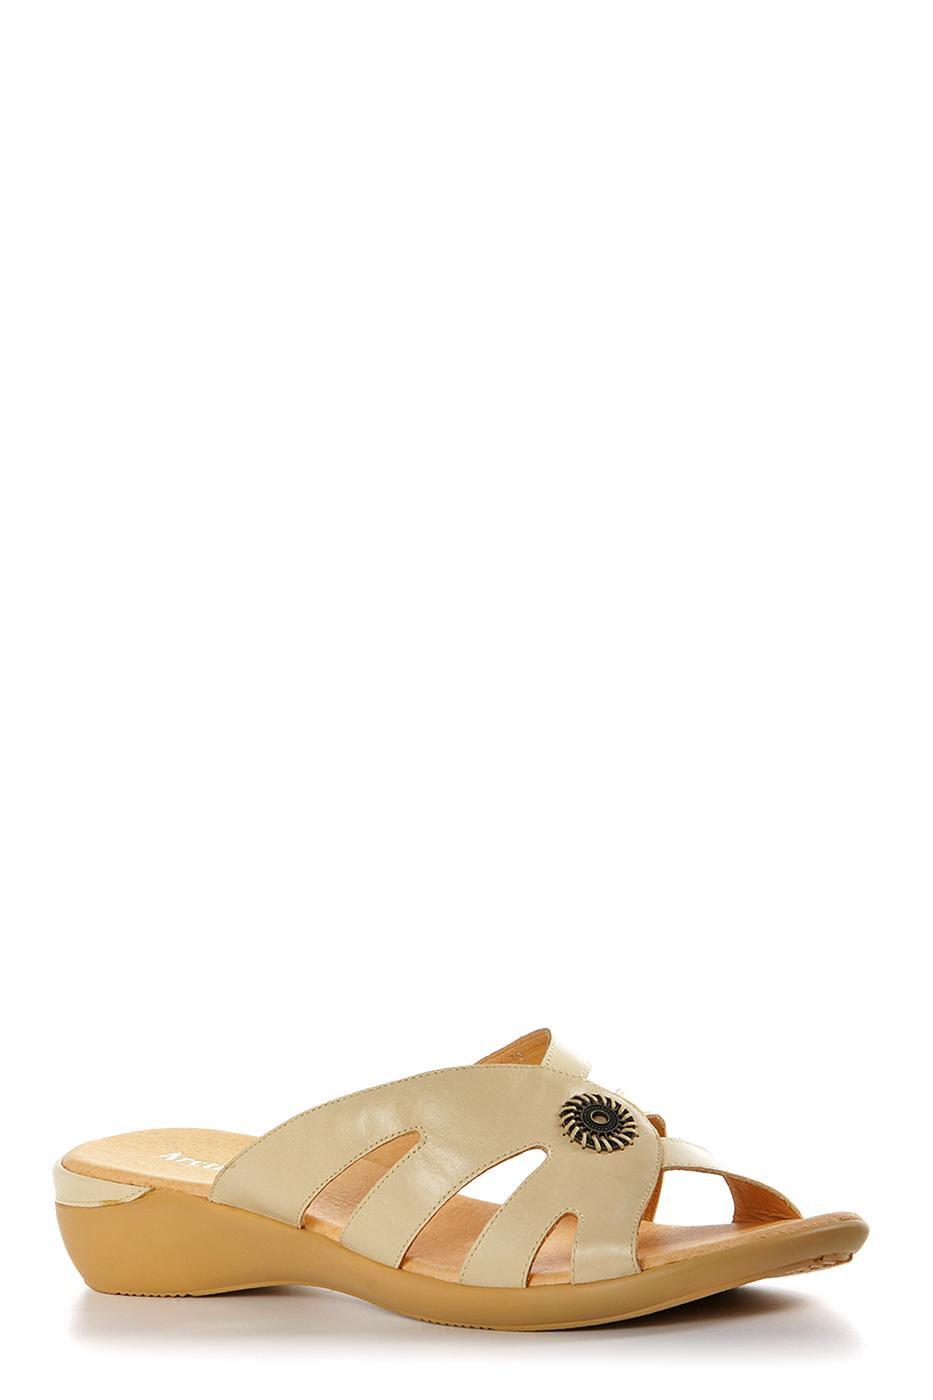 НАТУРАЛЬНАЯ КОЖА    Сабо ARCTIC FOX (20430-1APRICOT)